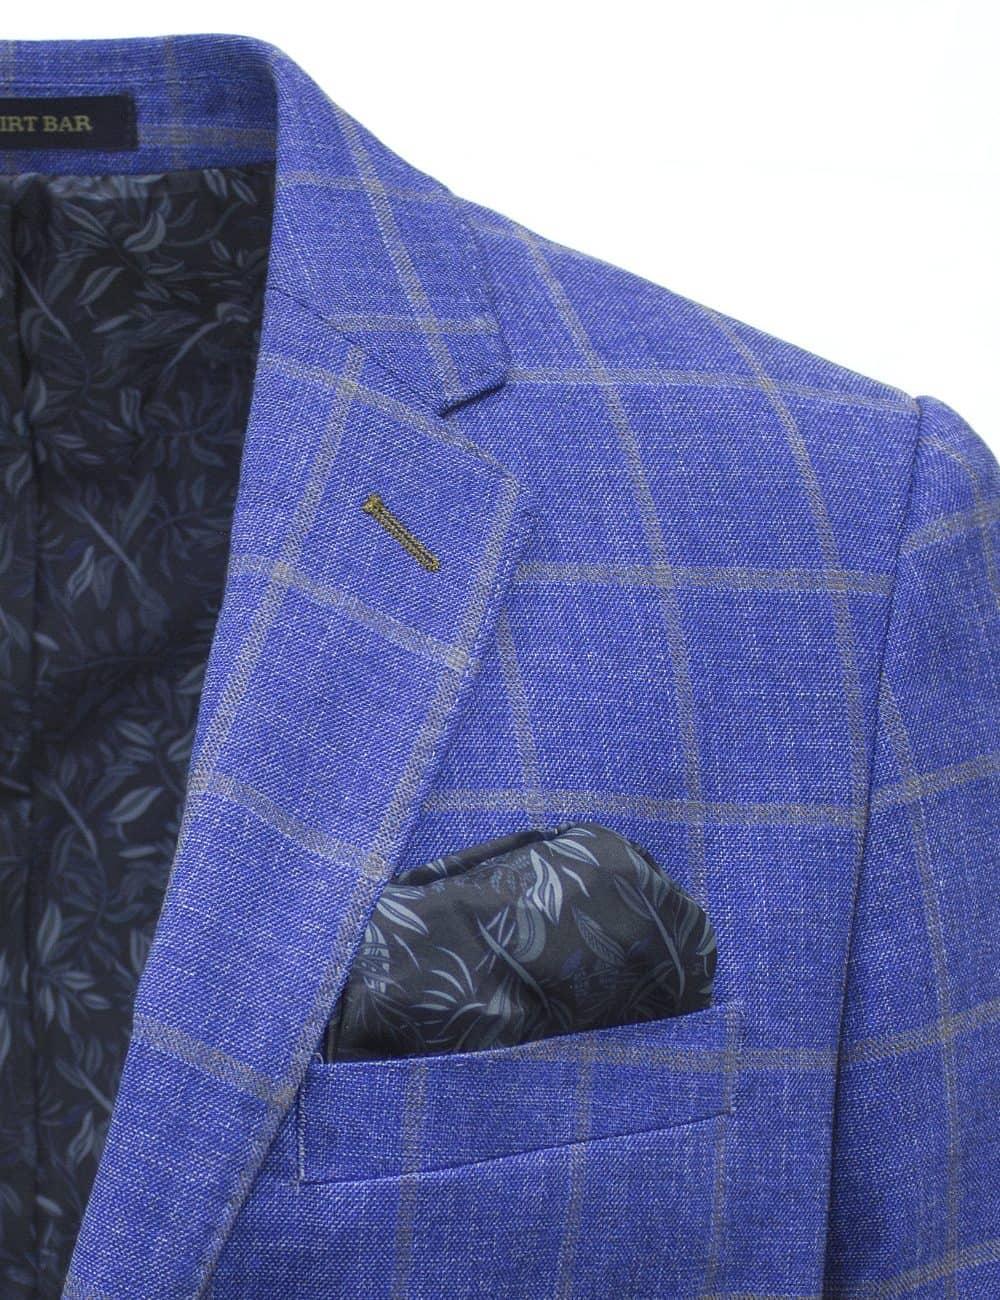 Slim Fit Light Blue Checks Single Breasted Blazer - S2B5.4